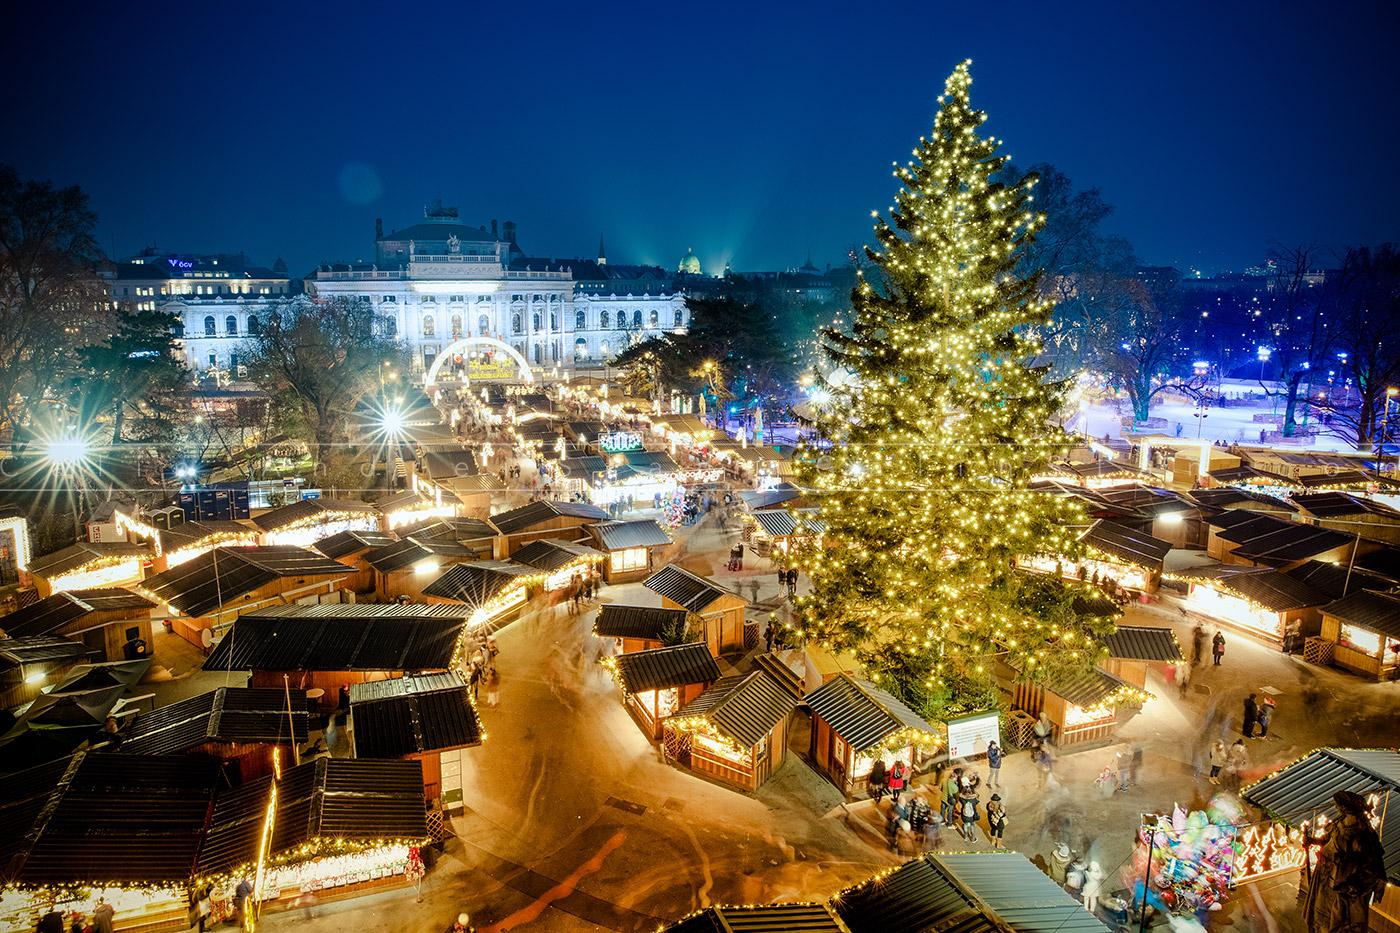 Viena, Decembrie 2016